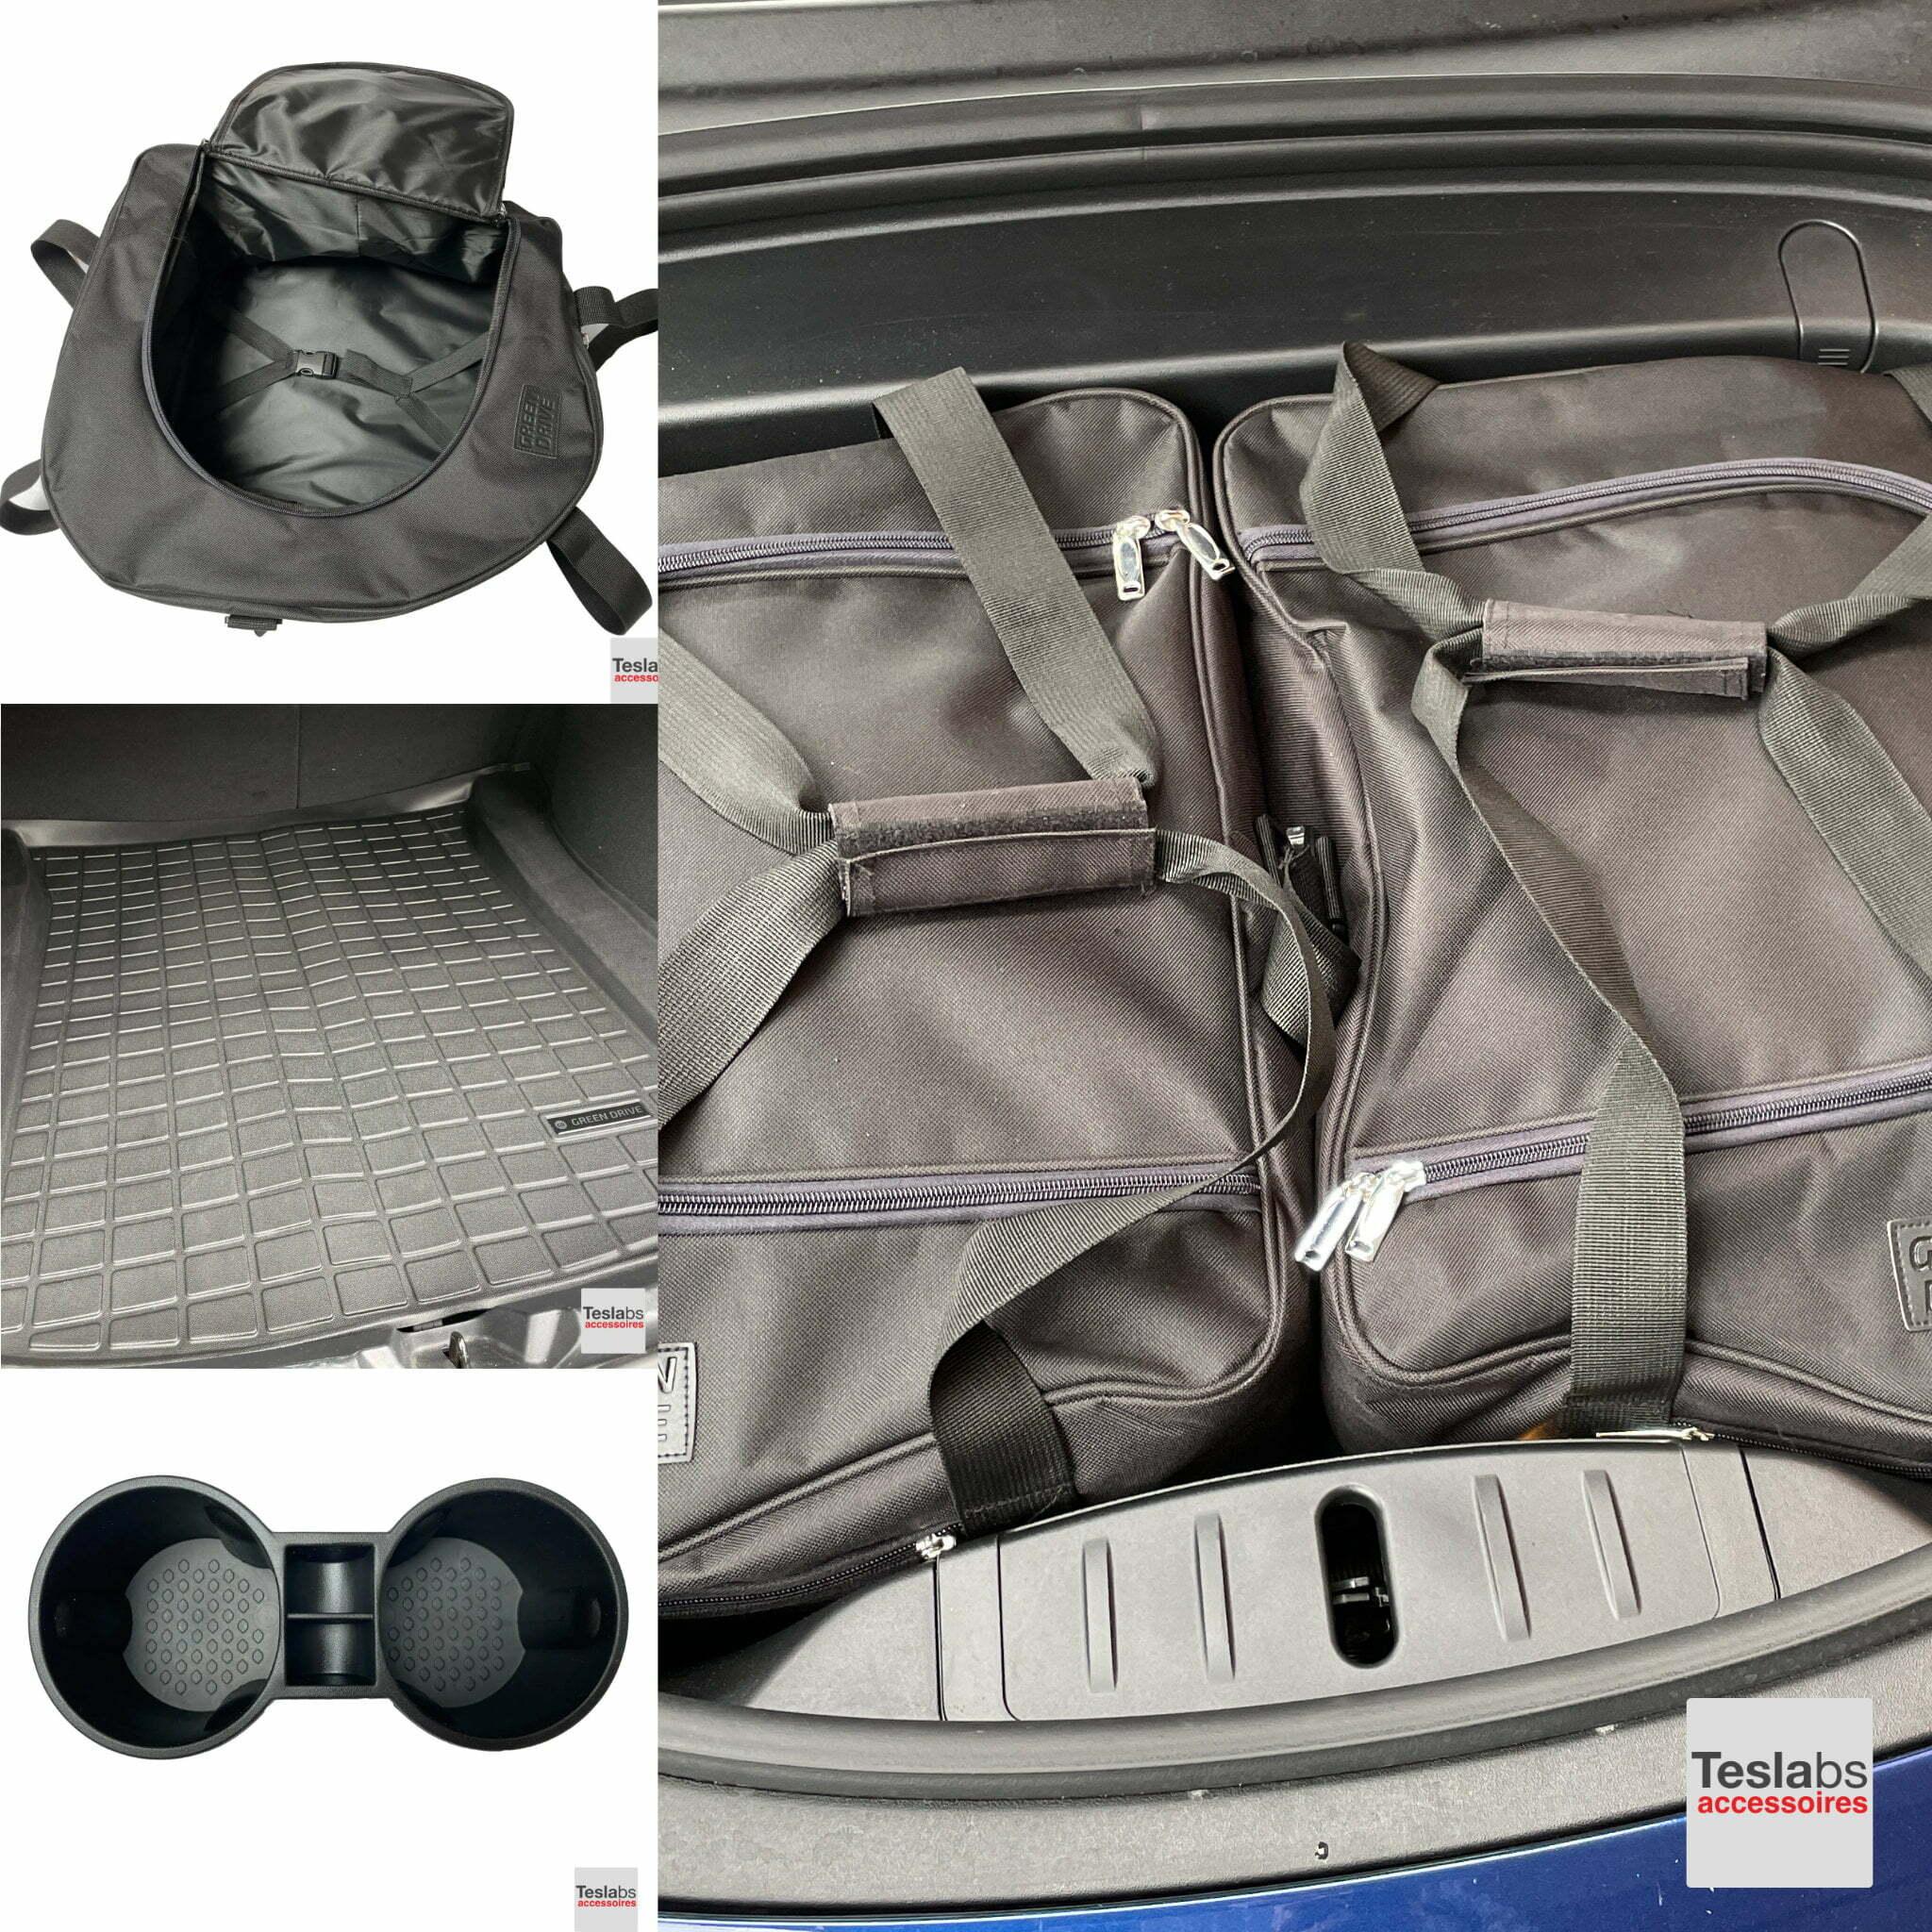 Tesla Model 3 - Travel essentials pakket